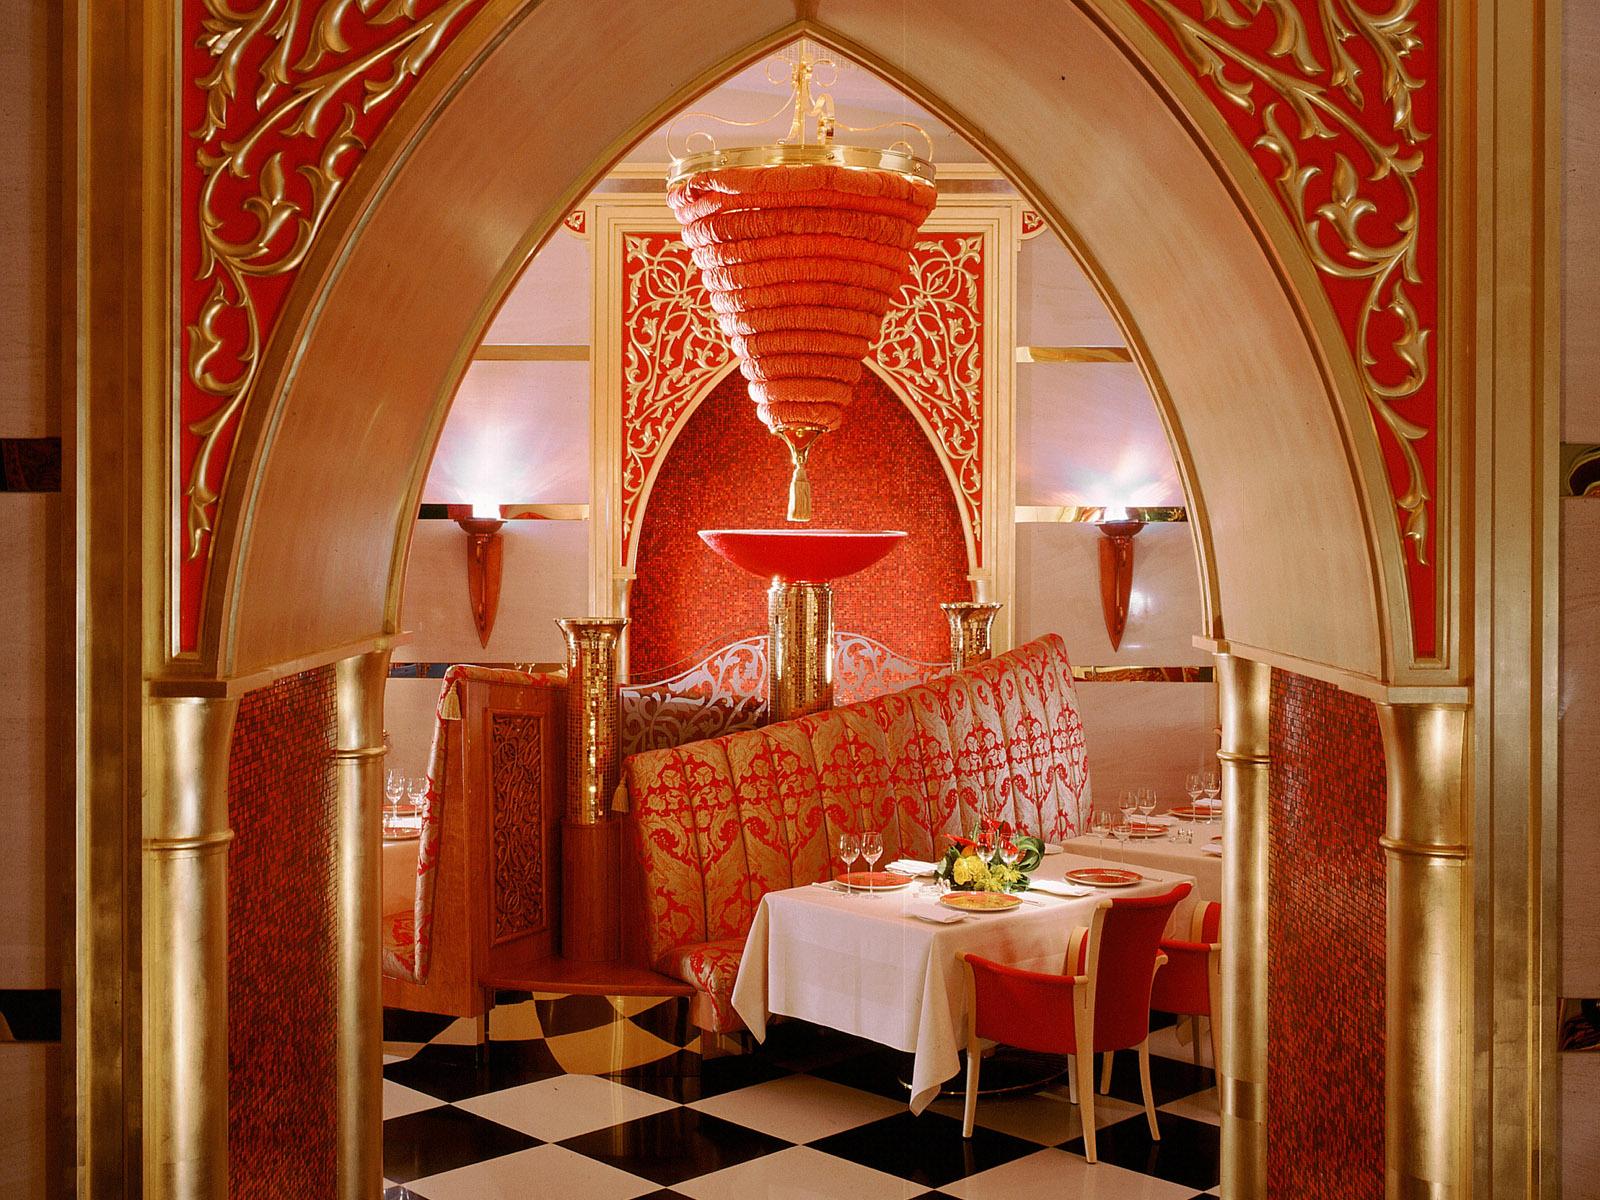 Palace Theme Hotel Interior Design Ideas